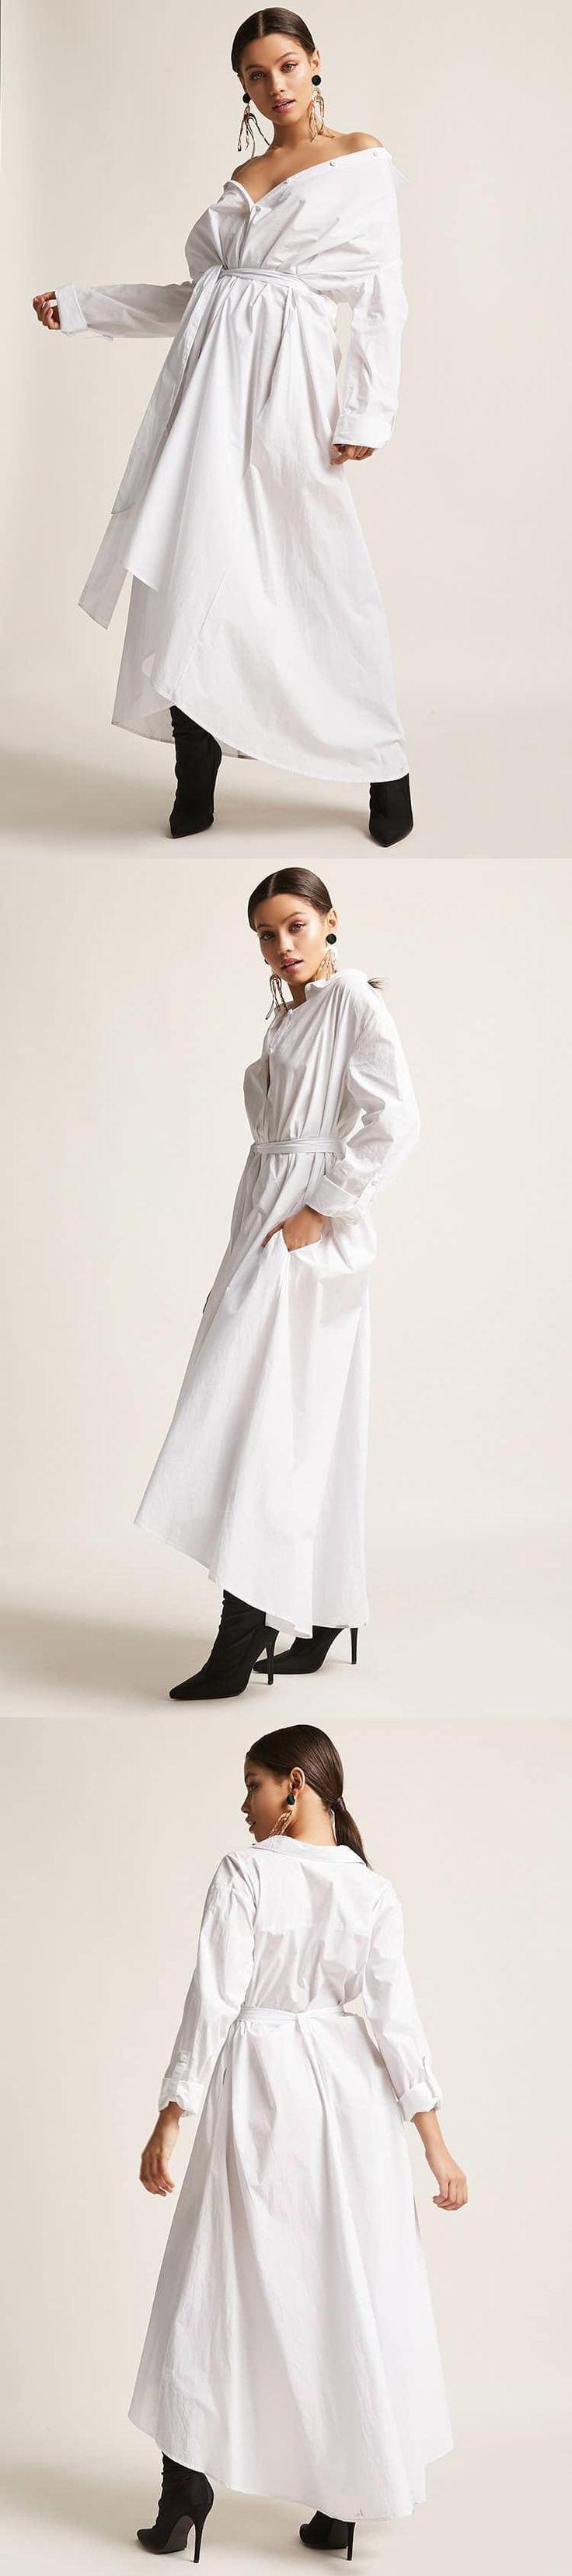 Poplin High-Low Maxi Shirt Dress // 68.00 USD // Forever 21